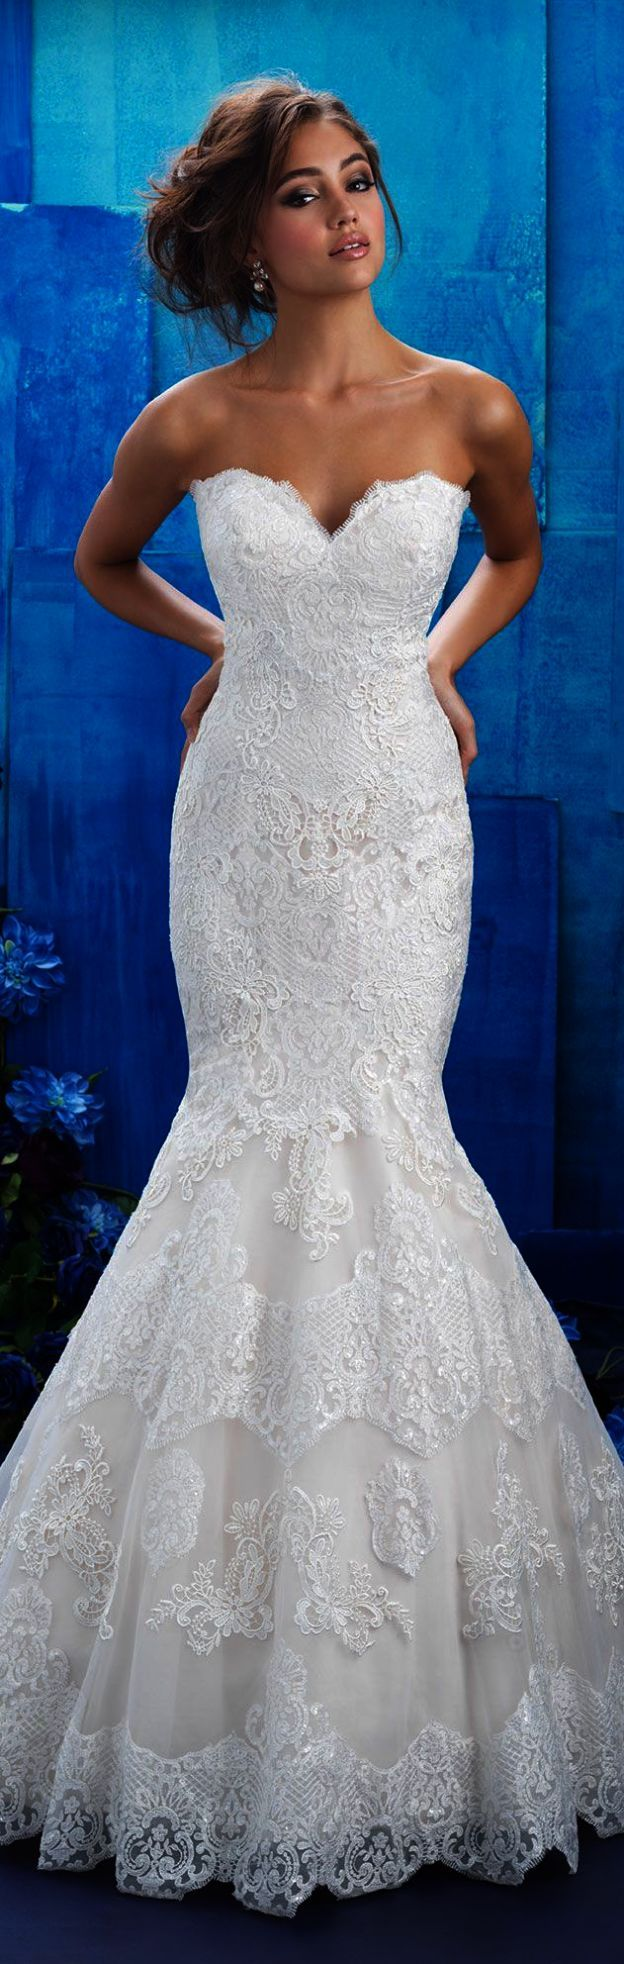 Rent wedding dress davids bridal  Lace Wedding Dresses Davidus Bridal Lace Wedding Dresses For Rent